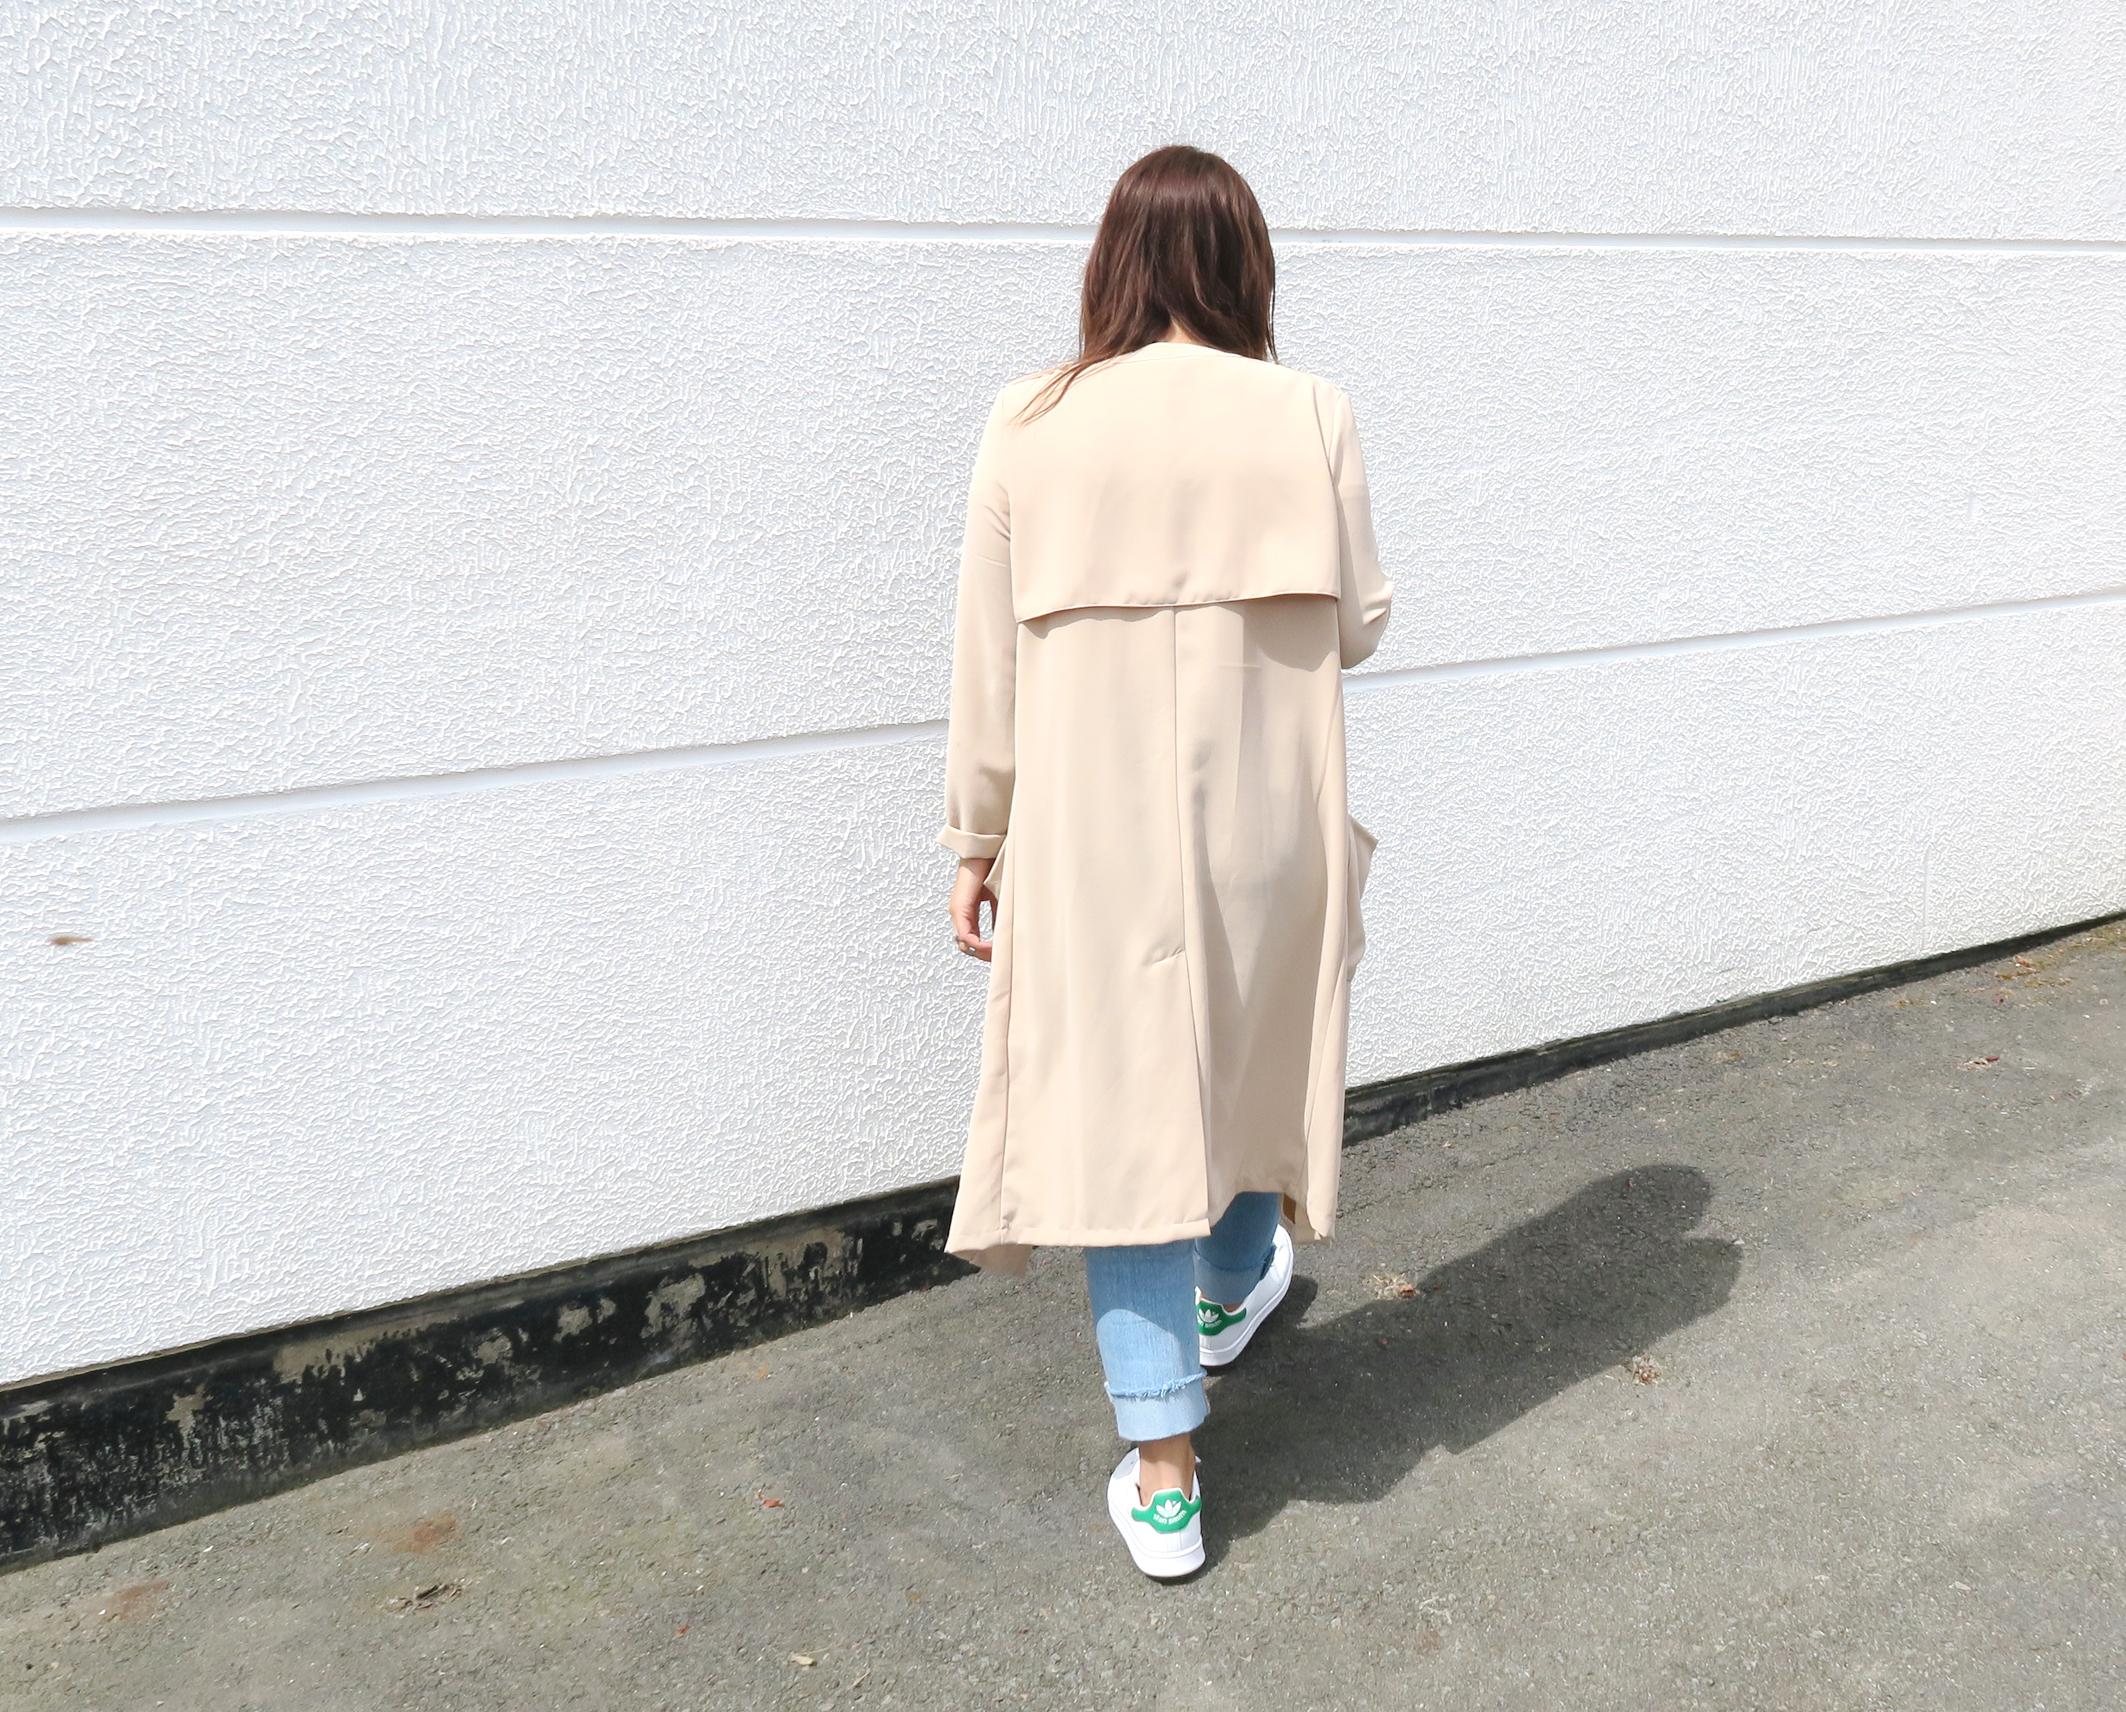 Blogger-Modesalat-Streetstyle-Bloggerstyle-Coat-Beige-Stansmith-7